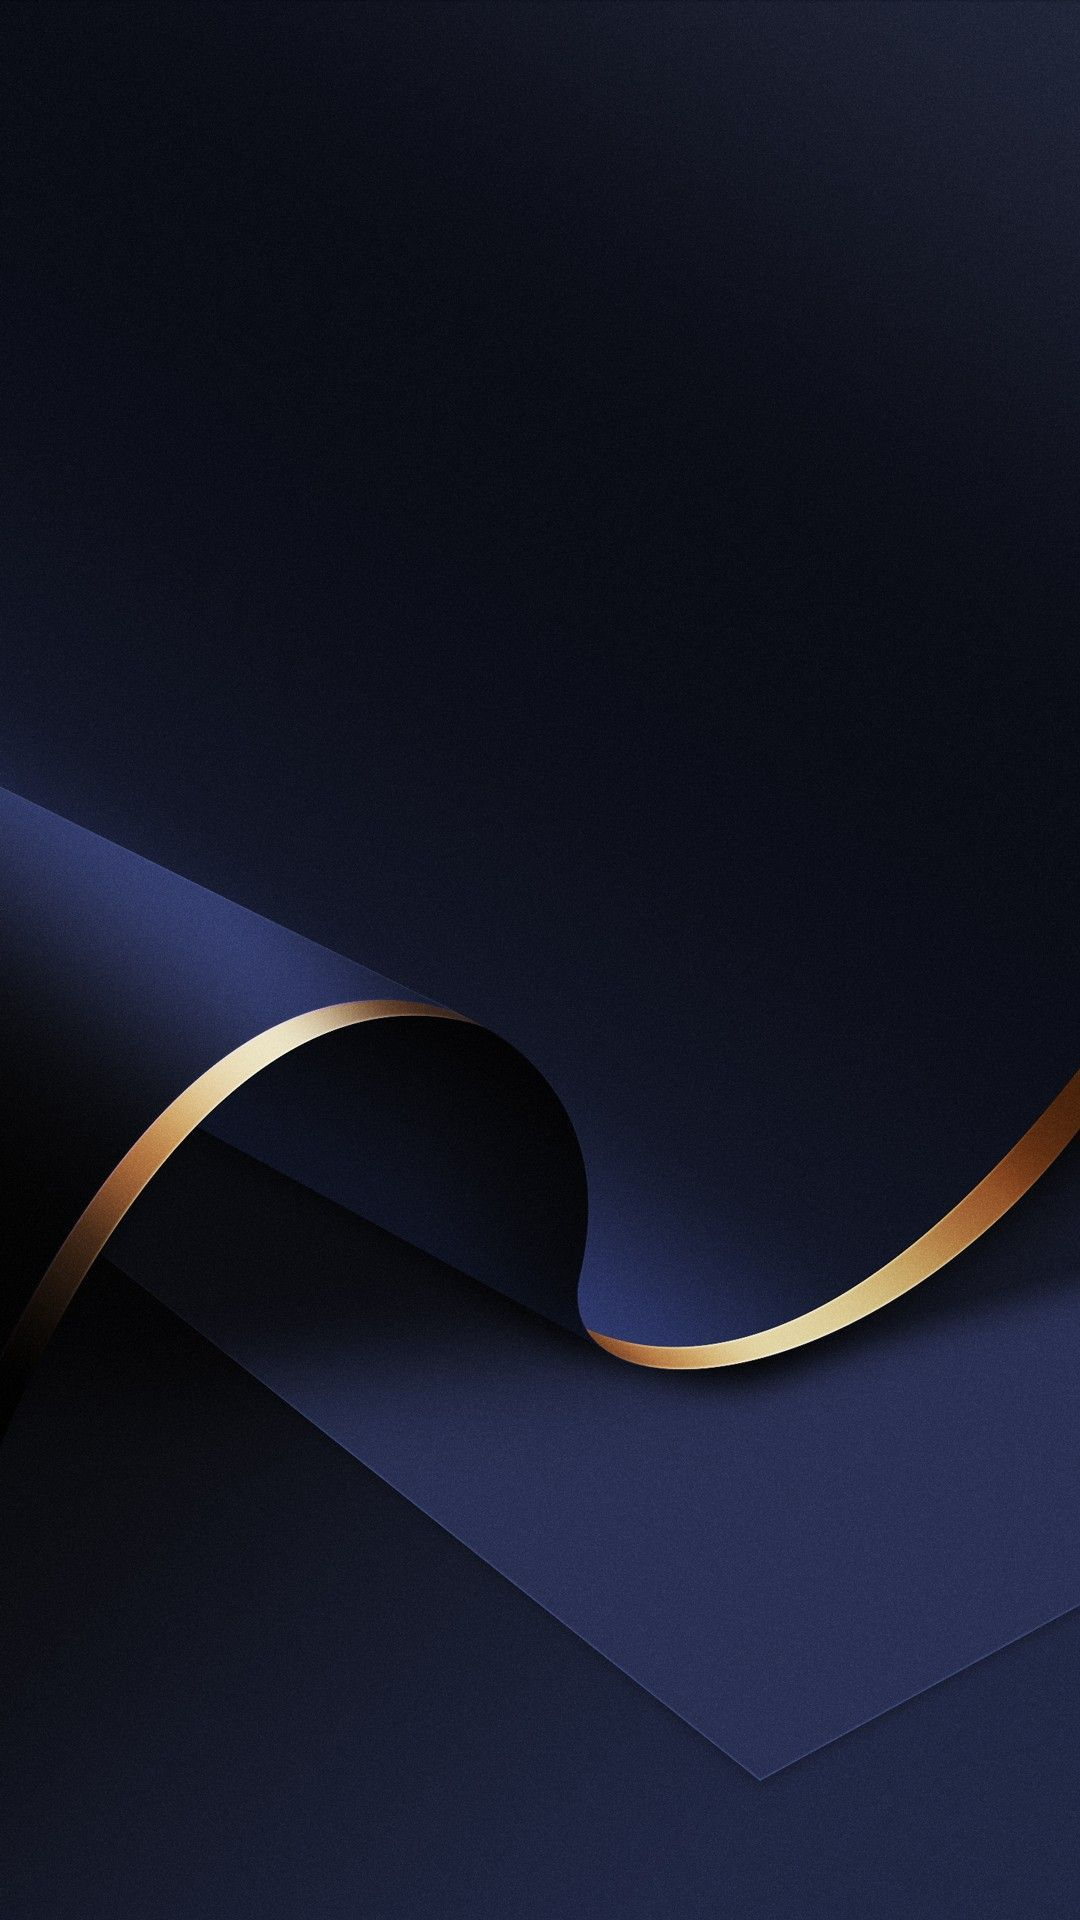 Dark Blue iPhone hd wallpaper